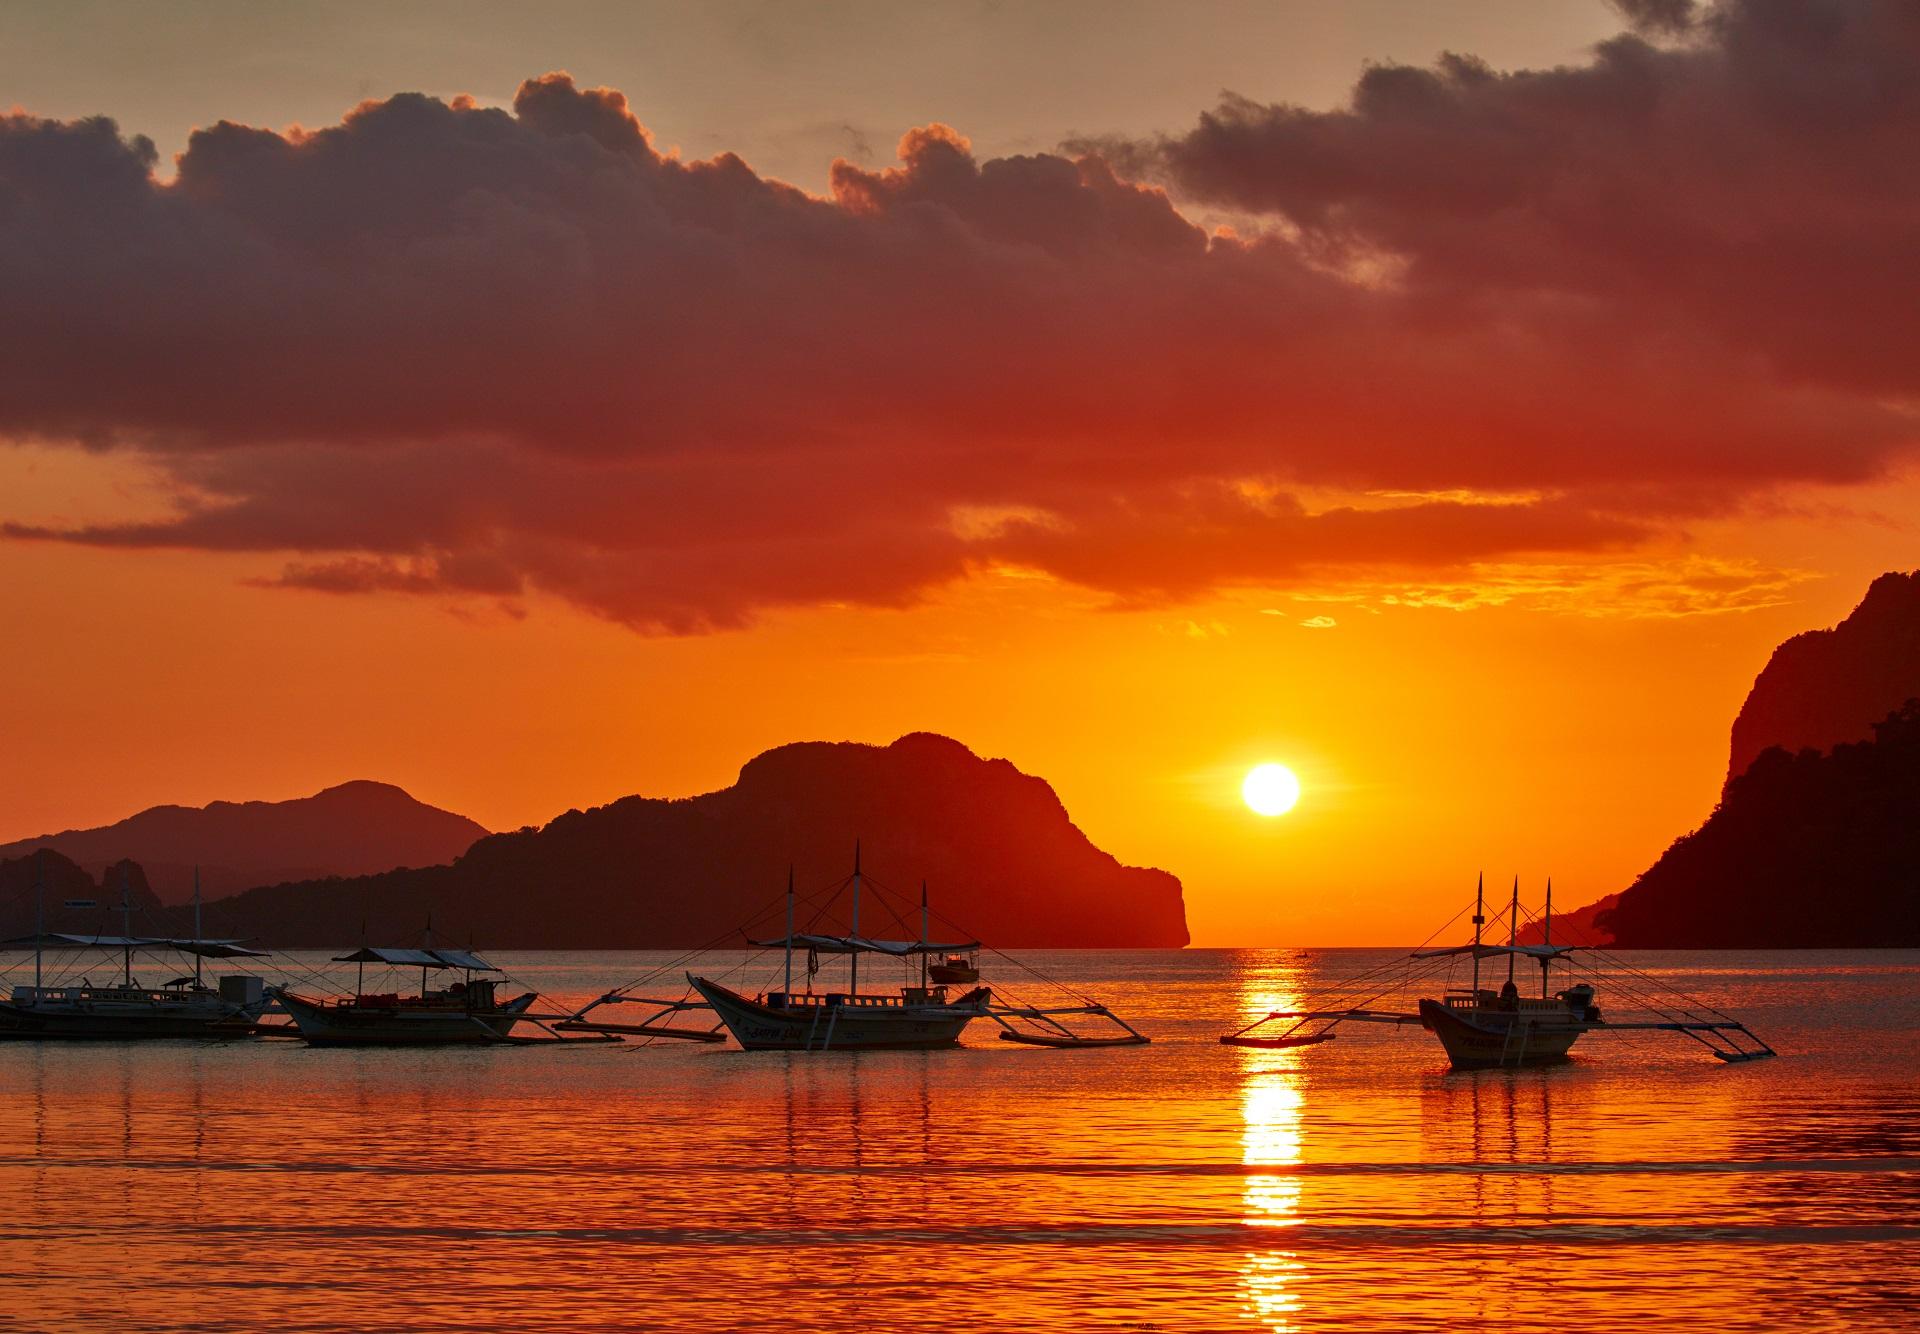 El Nido_Philippinen_sunset_shutterstock_432201058